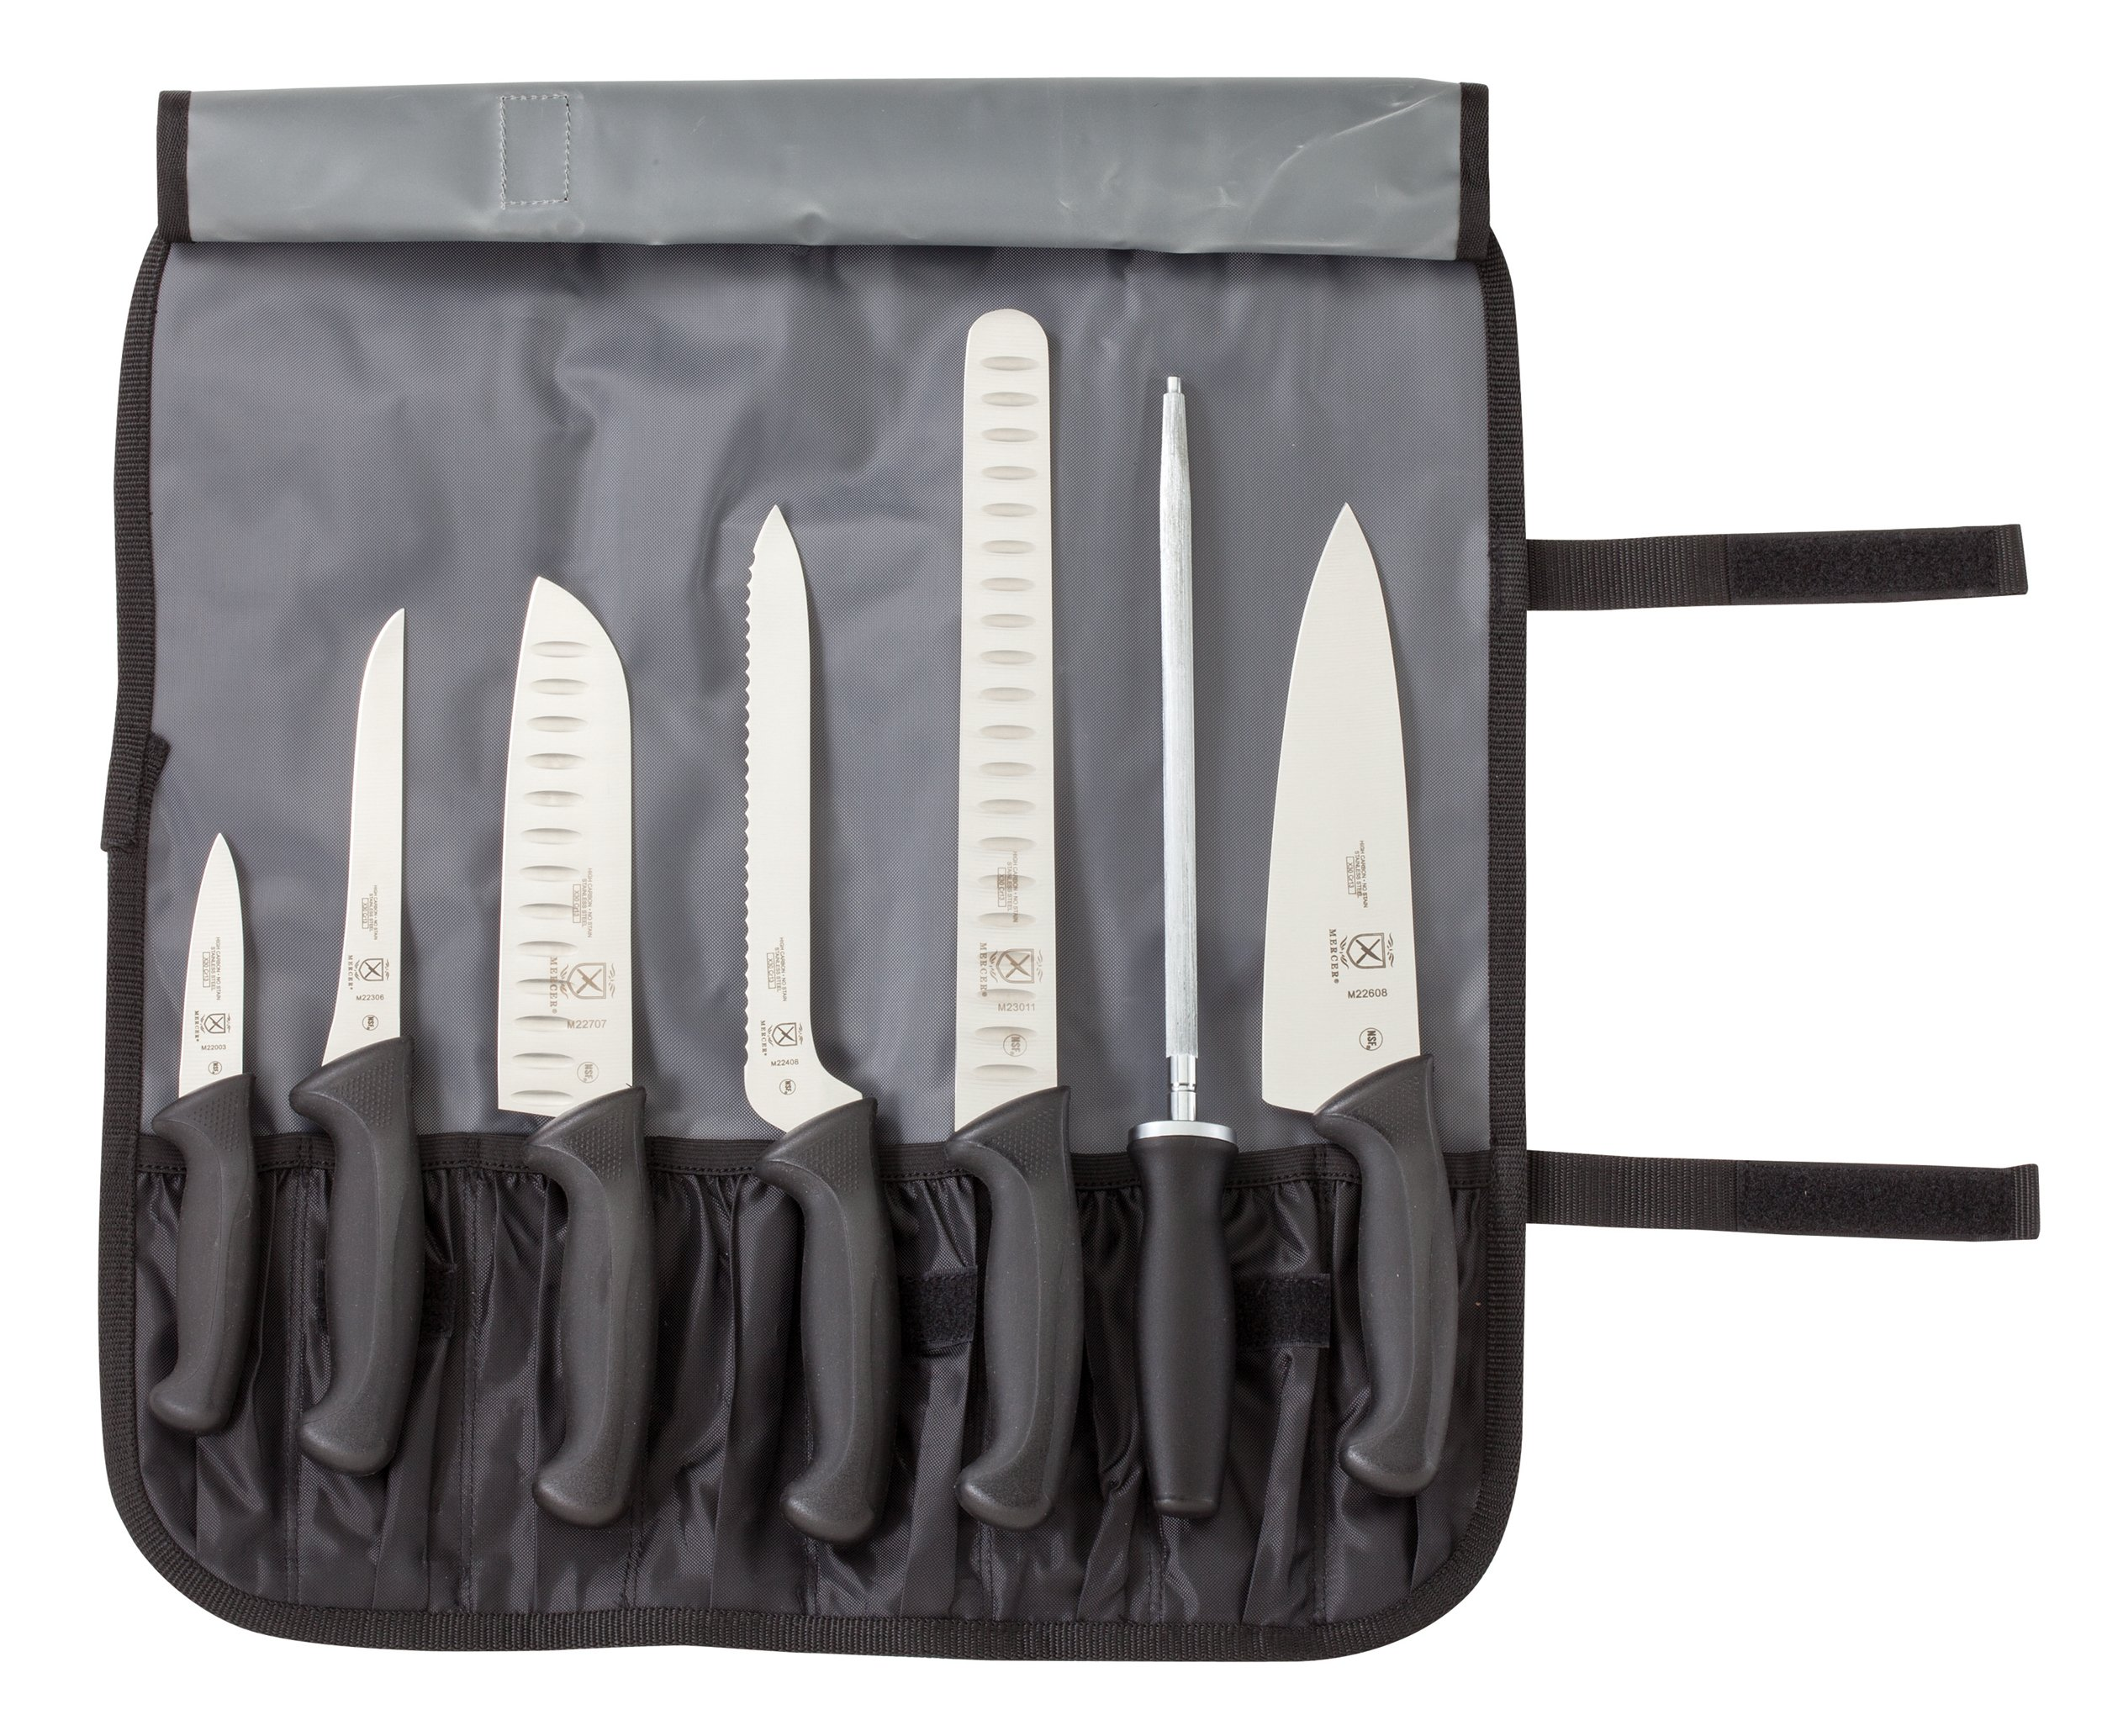 Mercer Culinary Millennia 8-Piece Knife Roll Set by Mercer Culinary